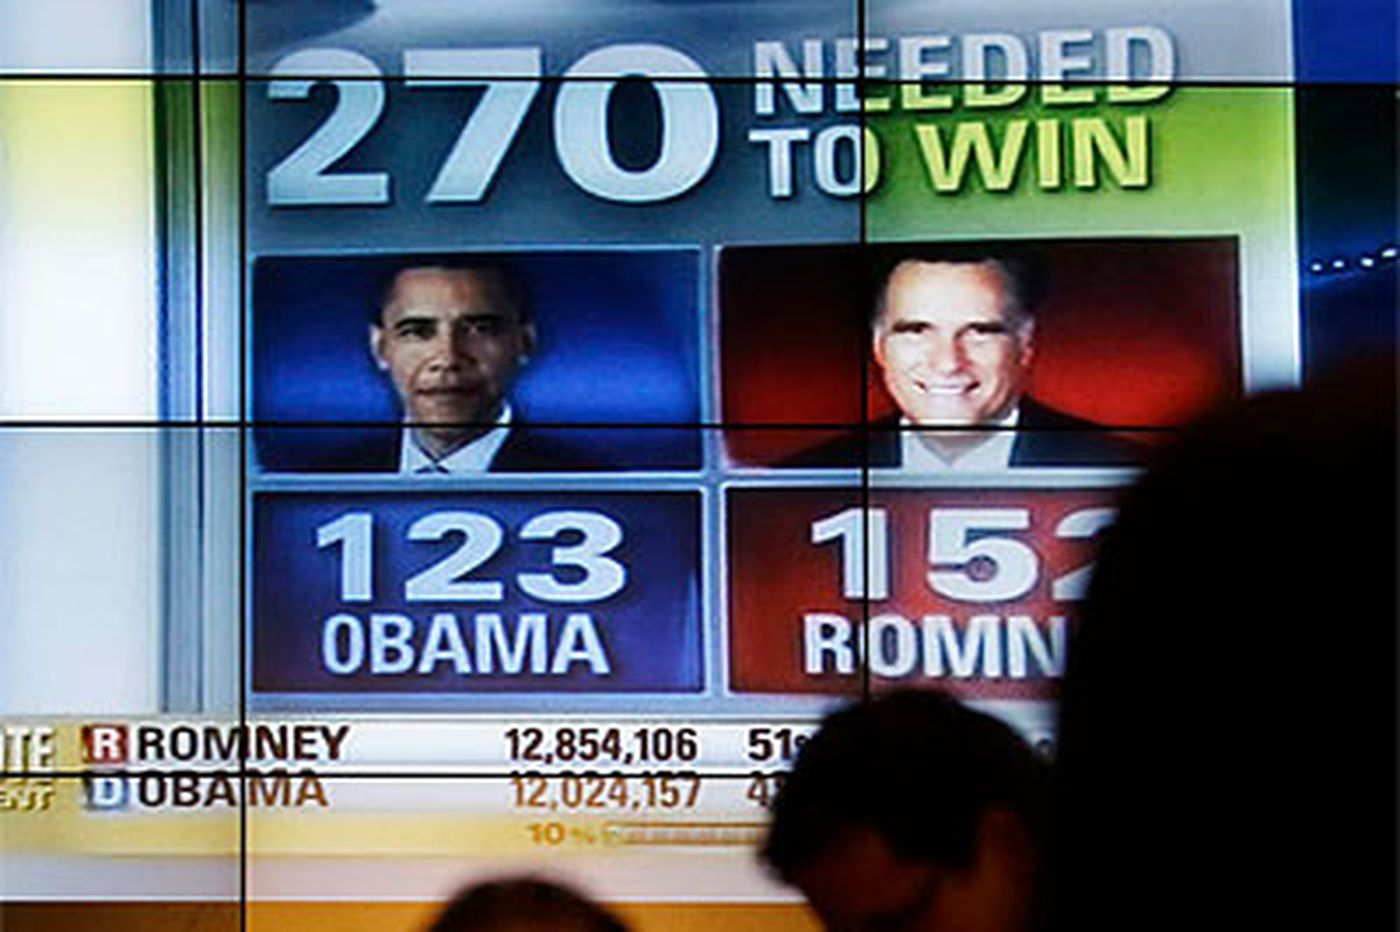 Jeff Gelles: The science of predicting election's winner